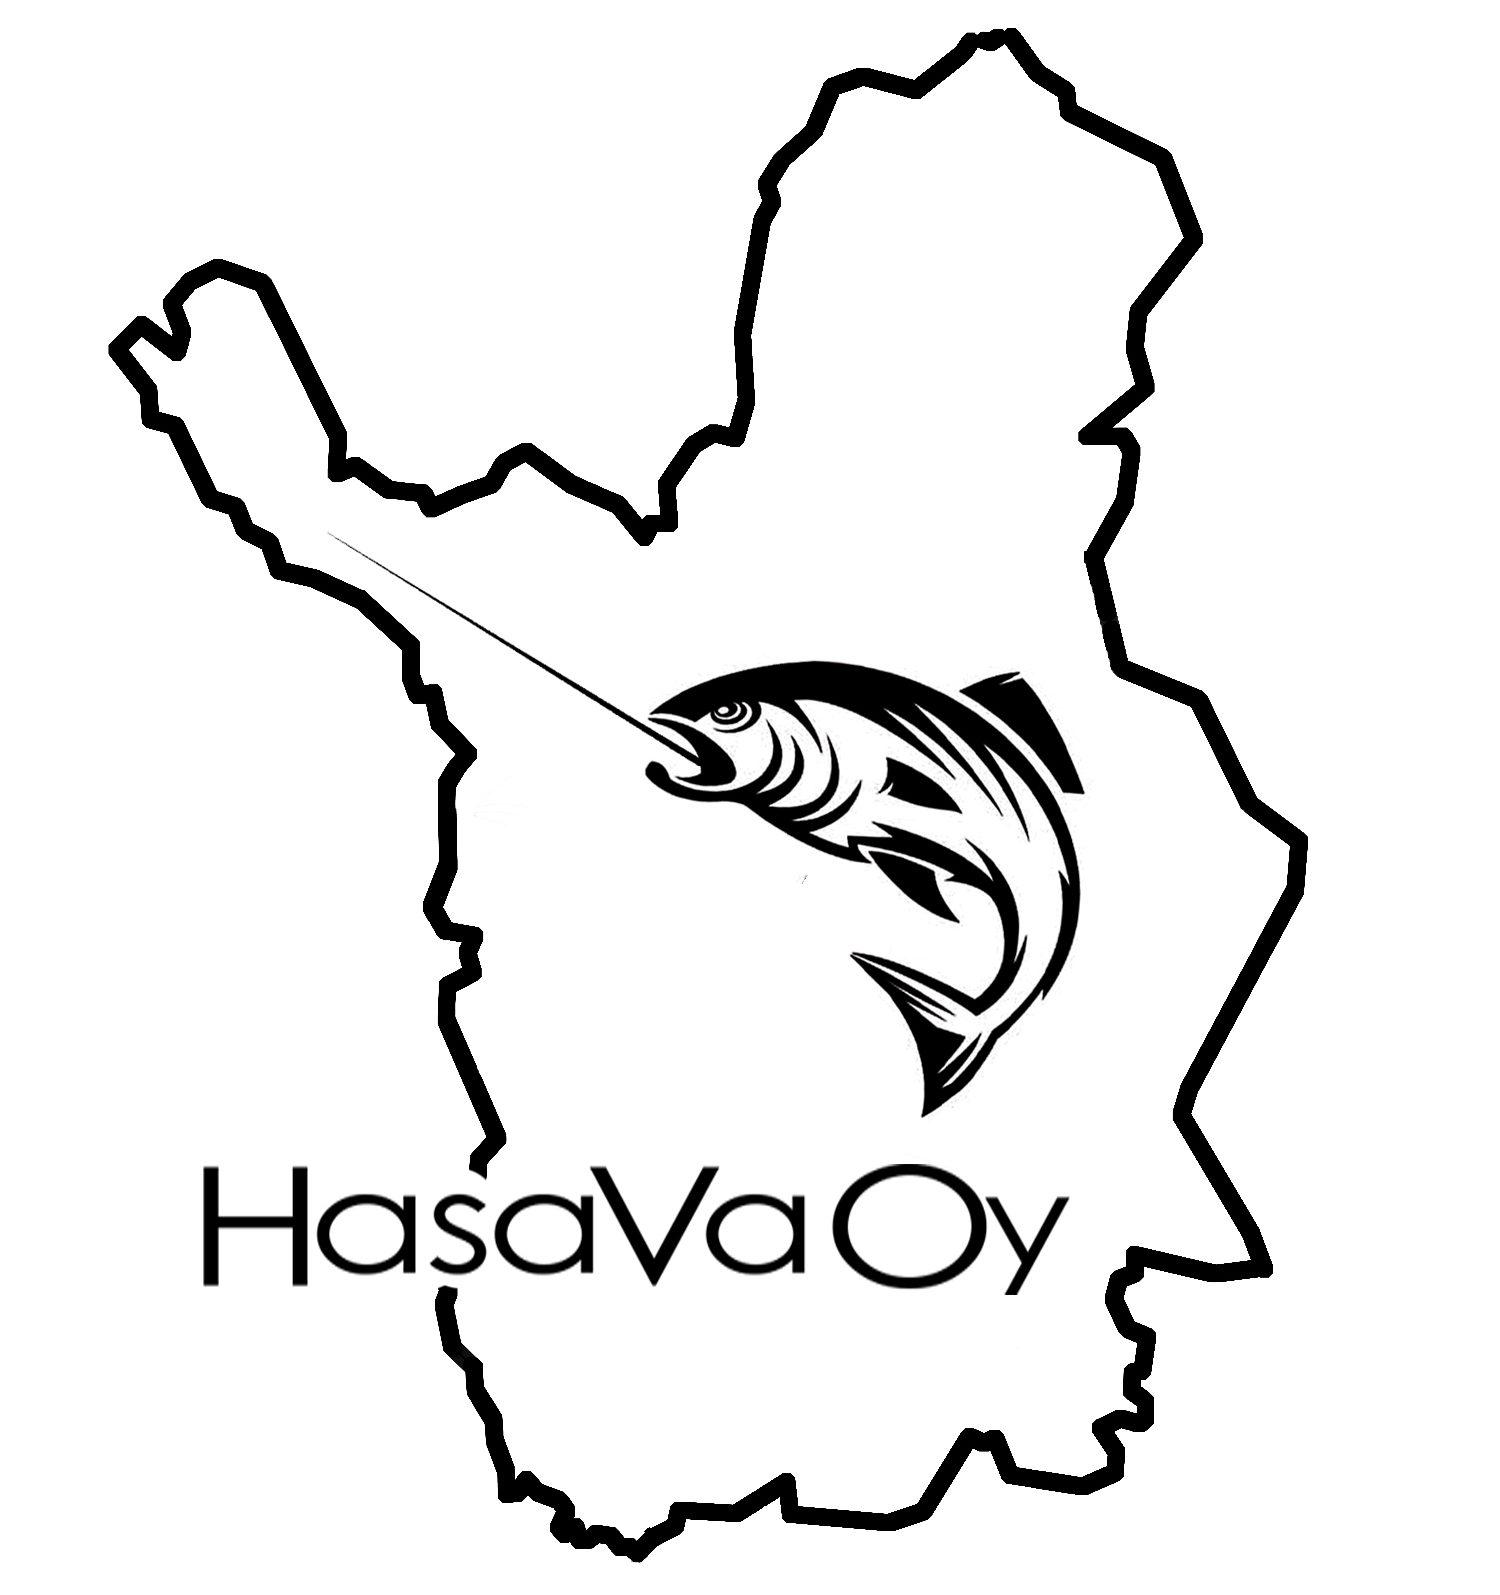 HasaVa Oy